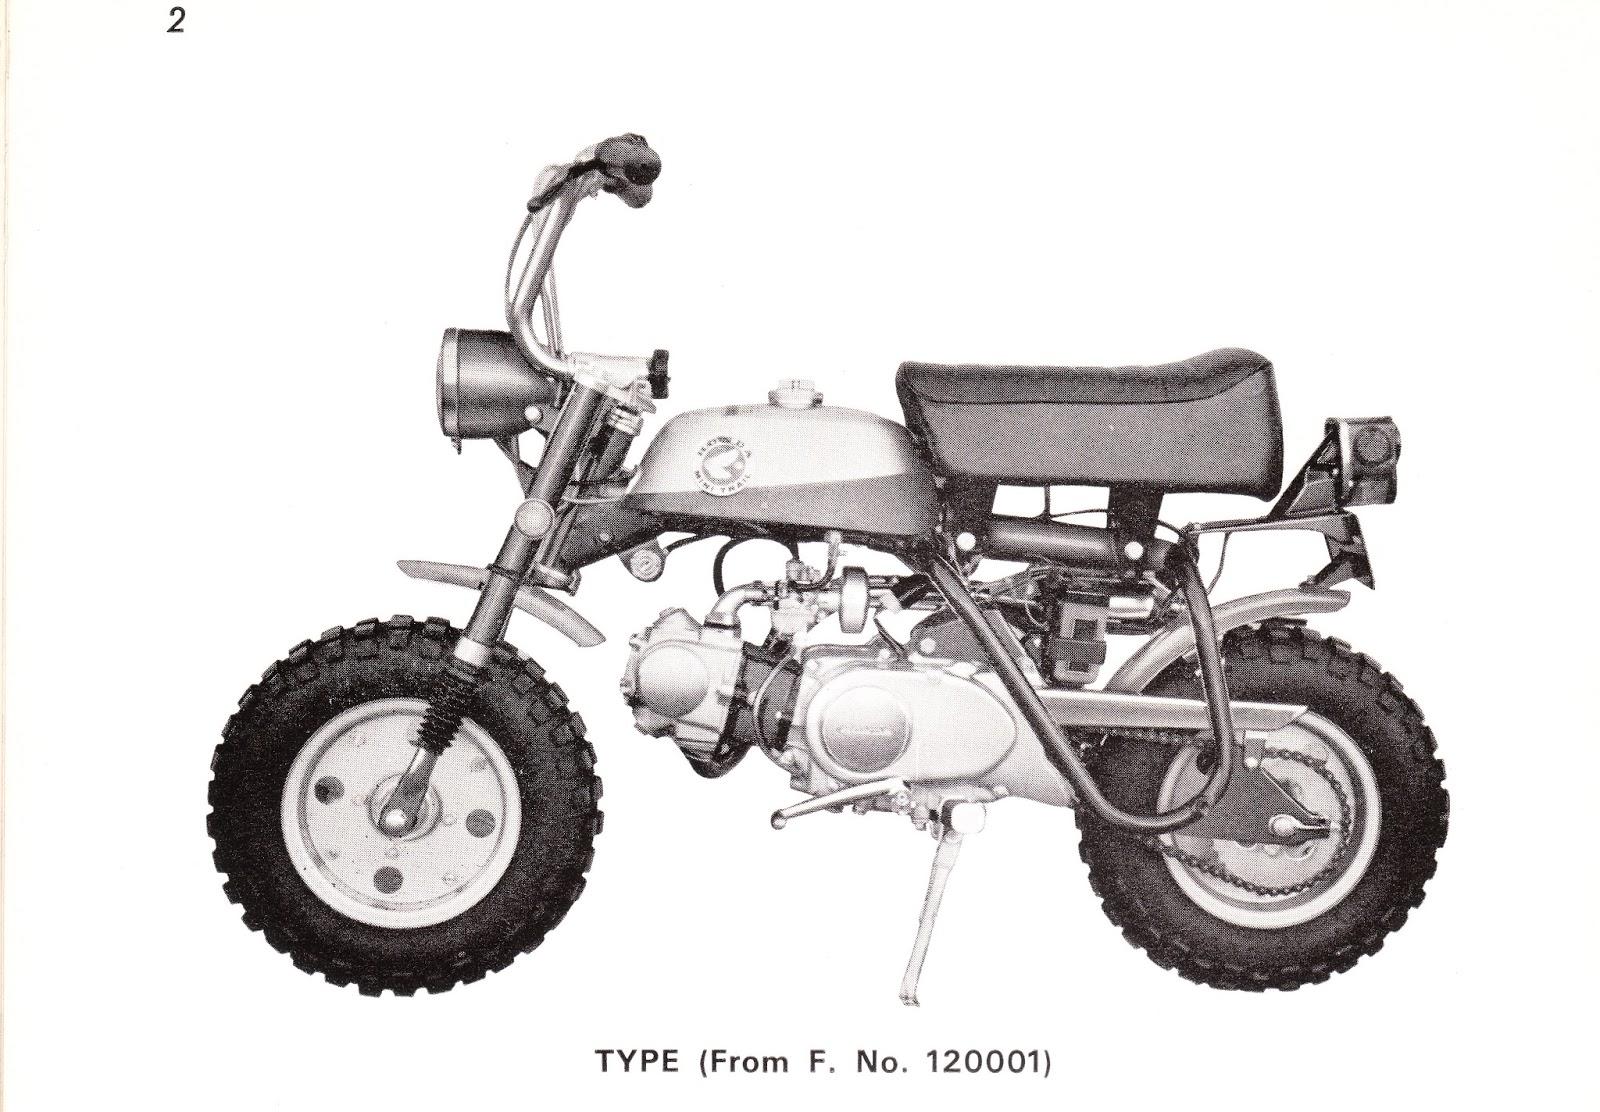 Honda Z50 Wiring Diagram Labelled Of Human Breathing System 1969 Sl350